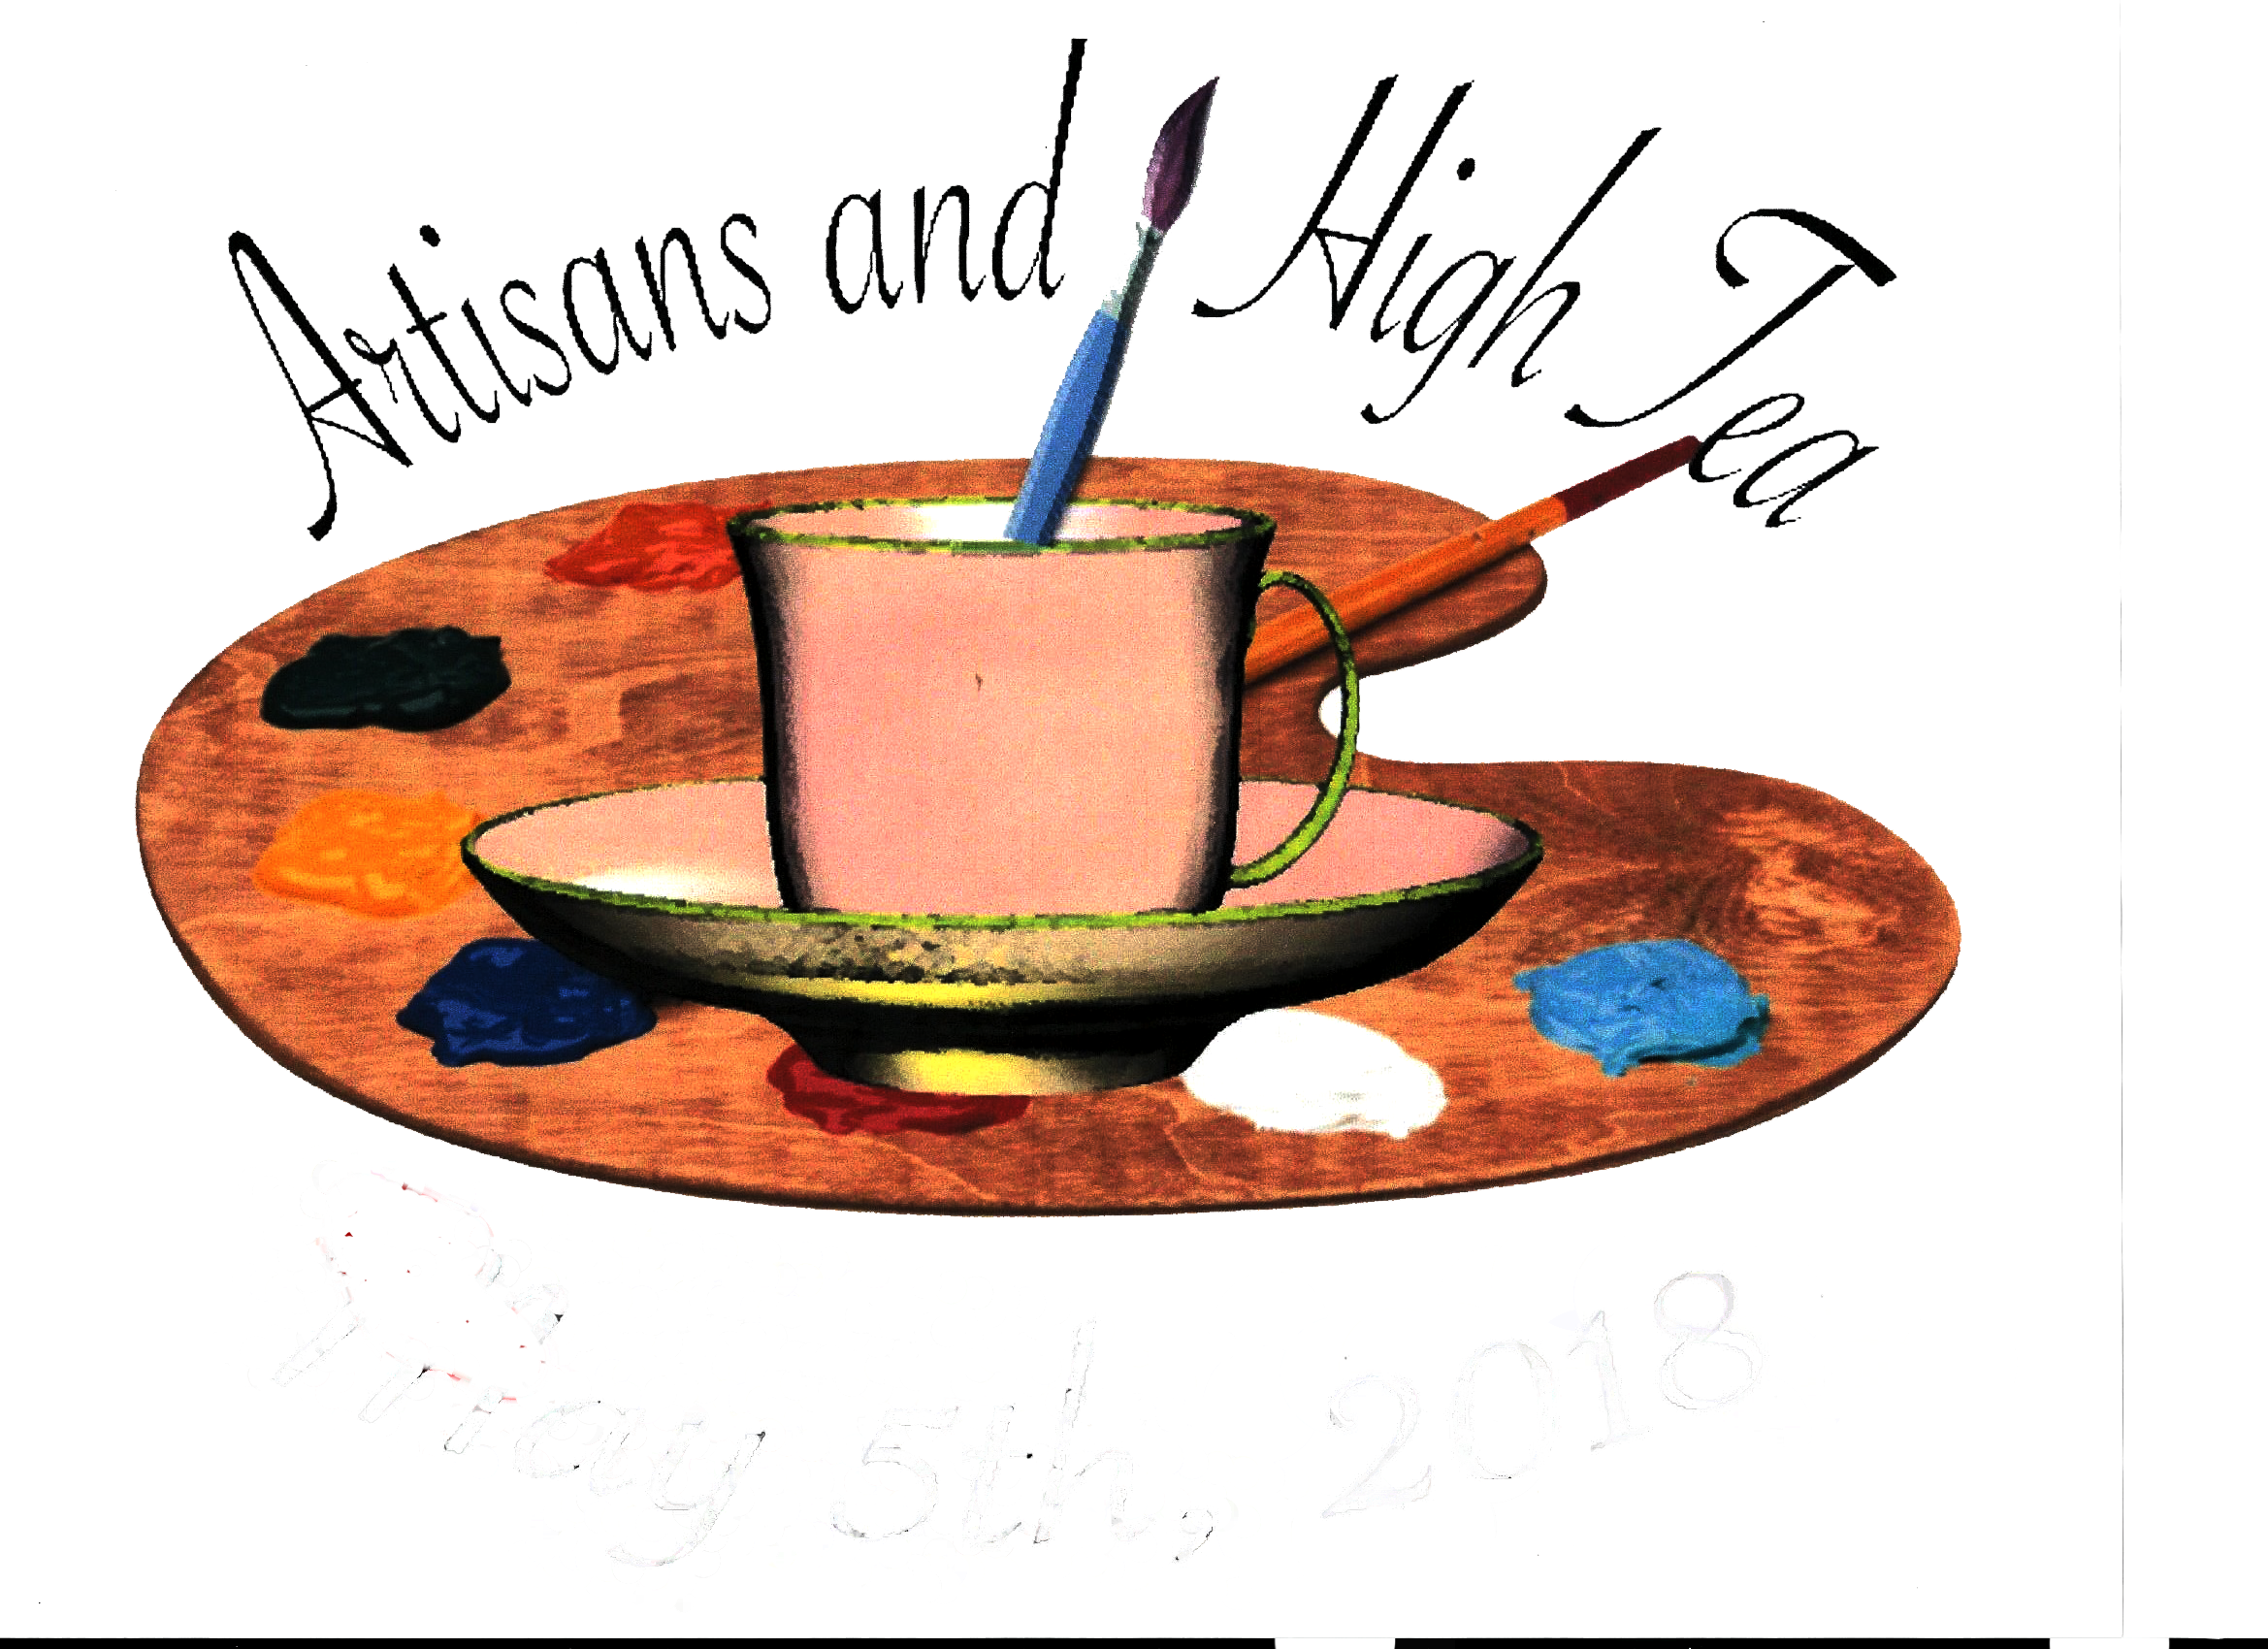 Artisans and High Tea Logo